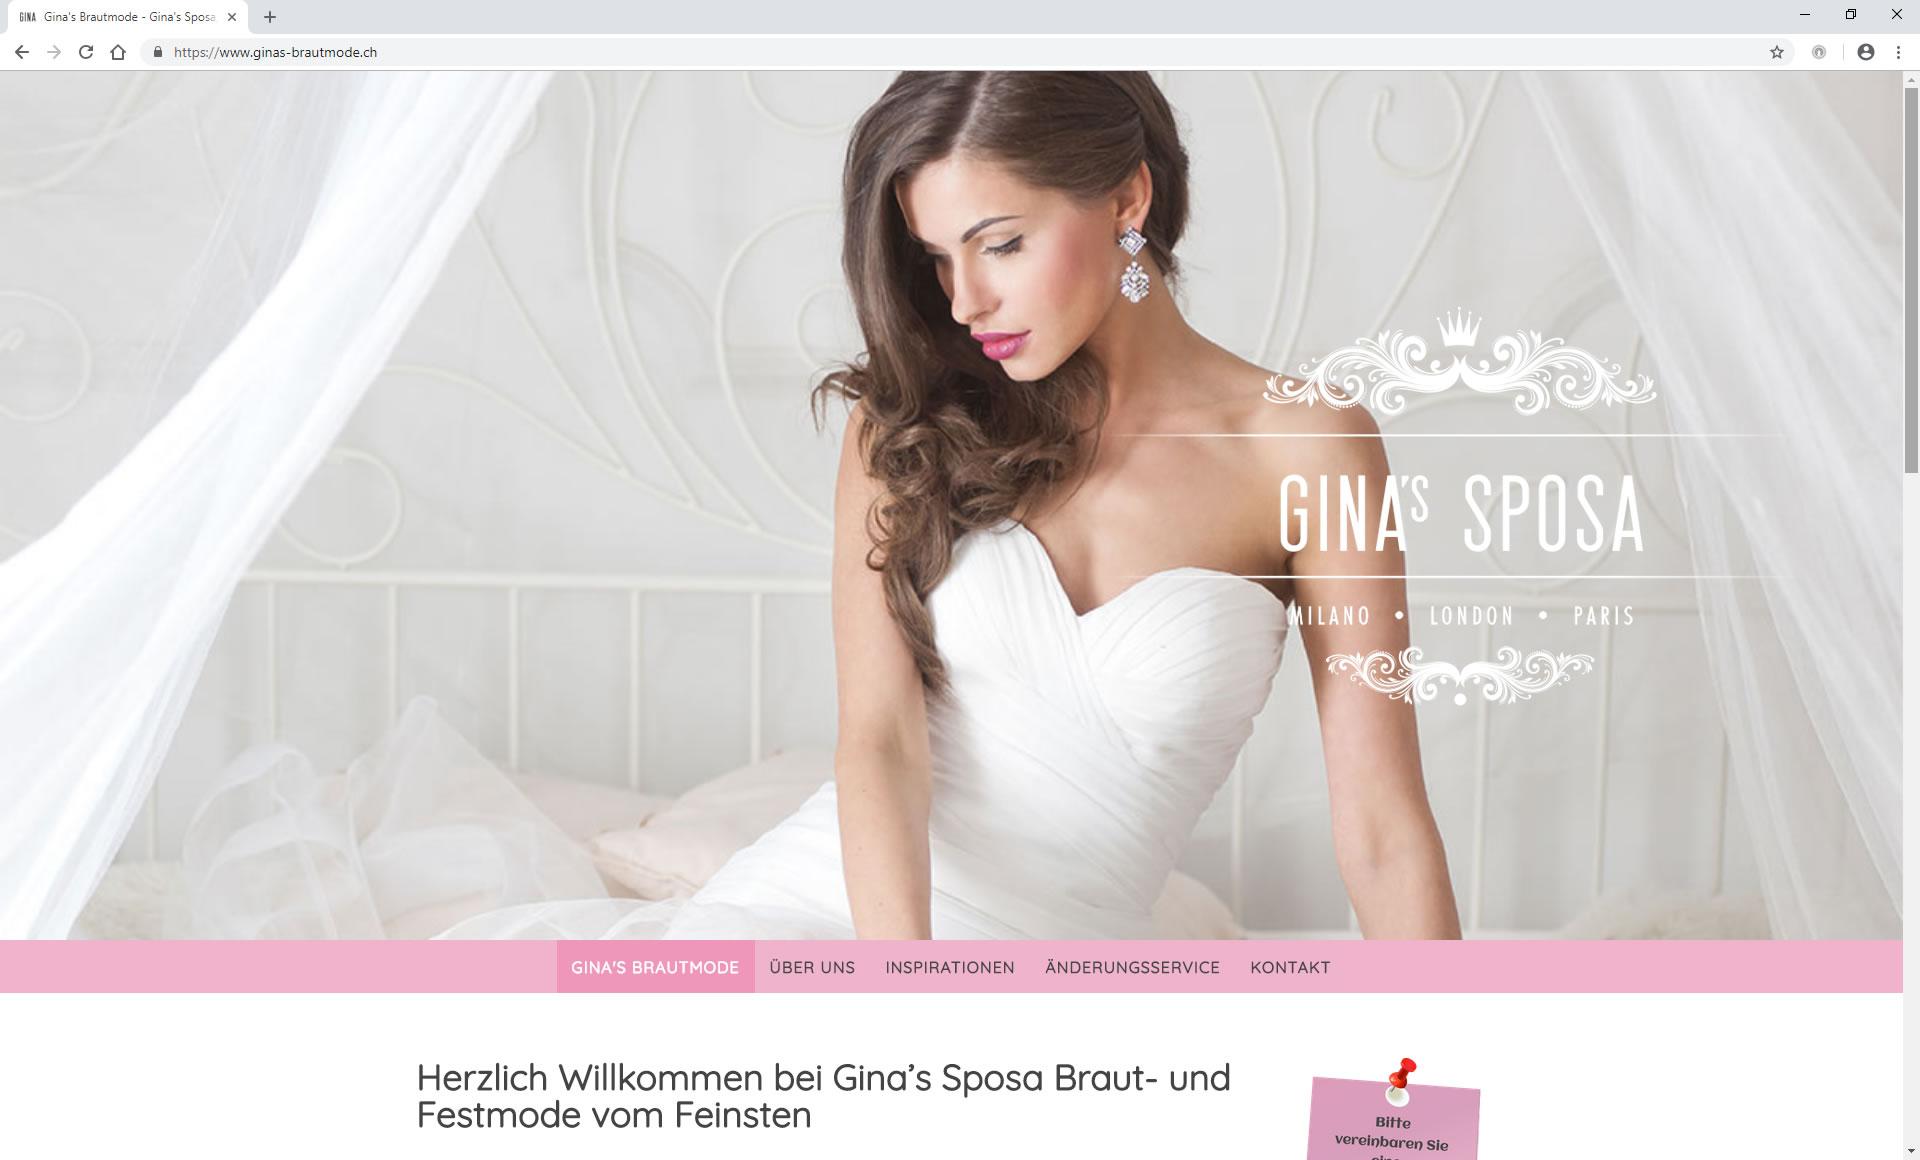 Gina's Braut- und Festmode, Rapperswil-Jona